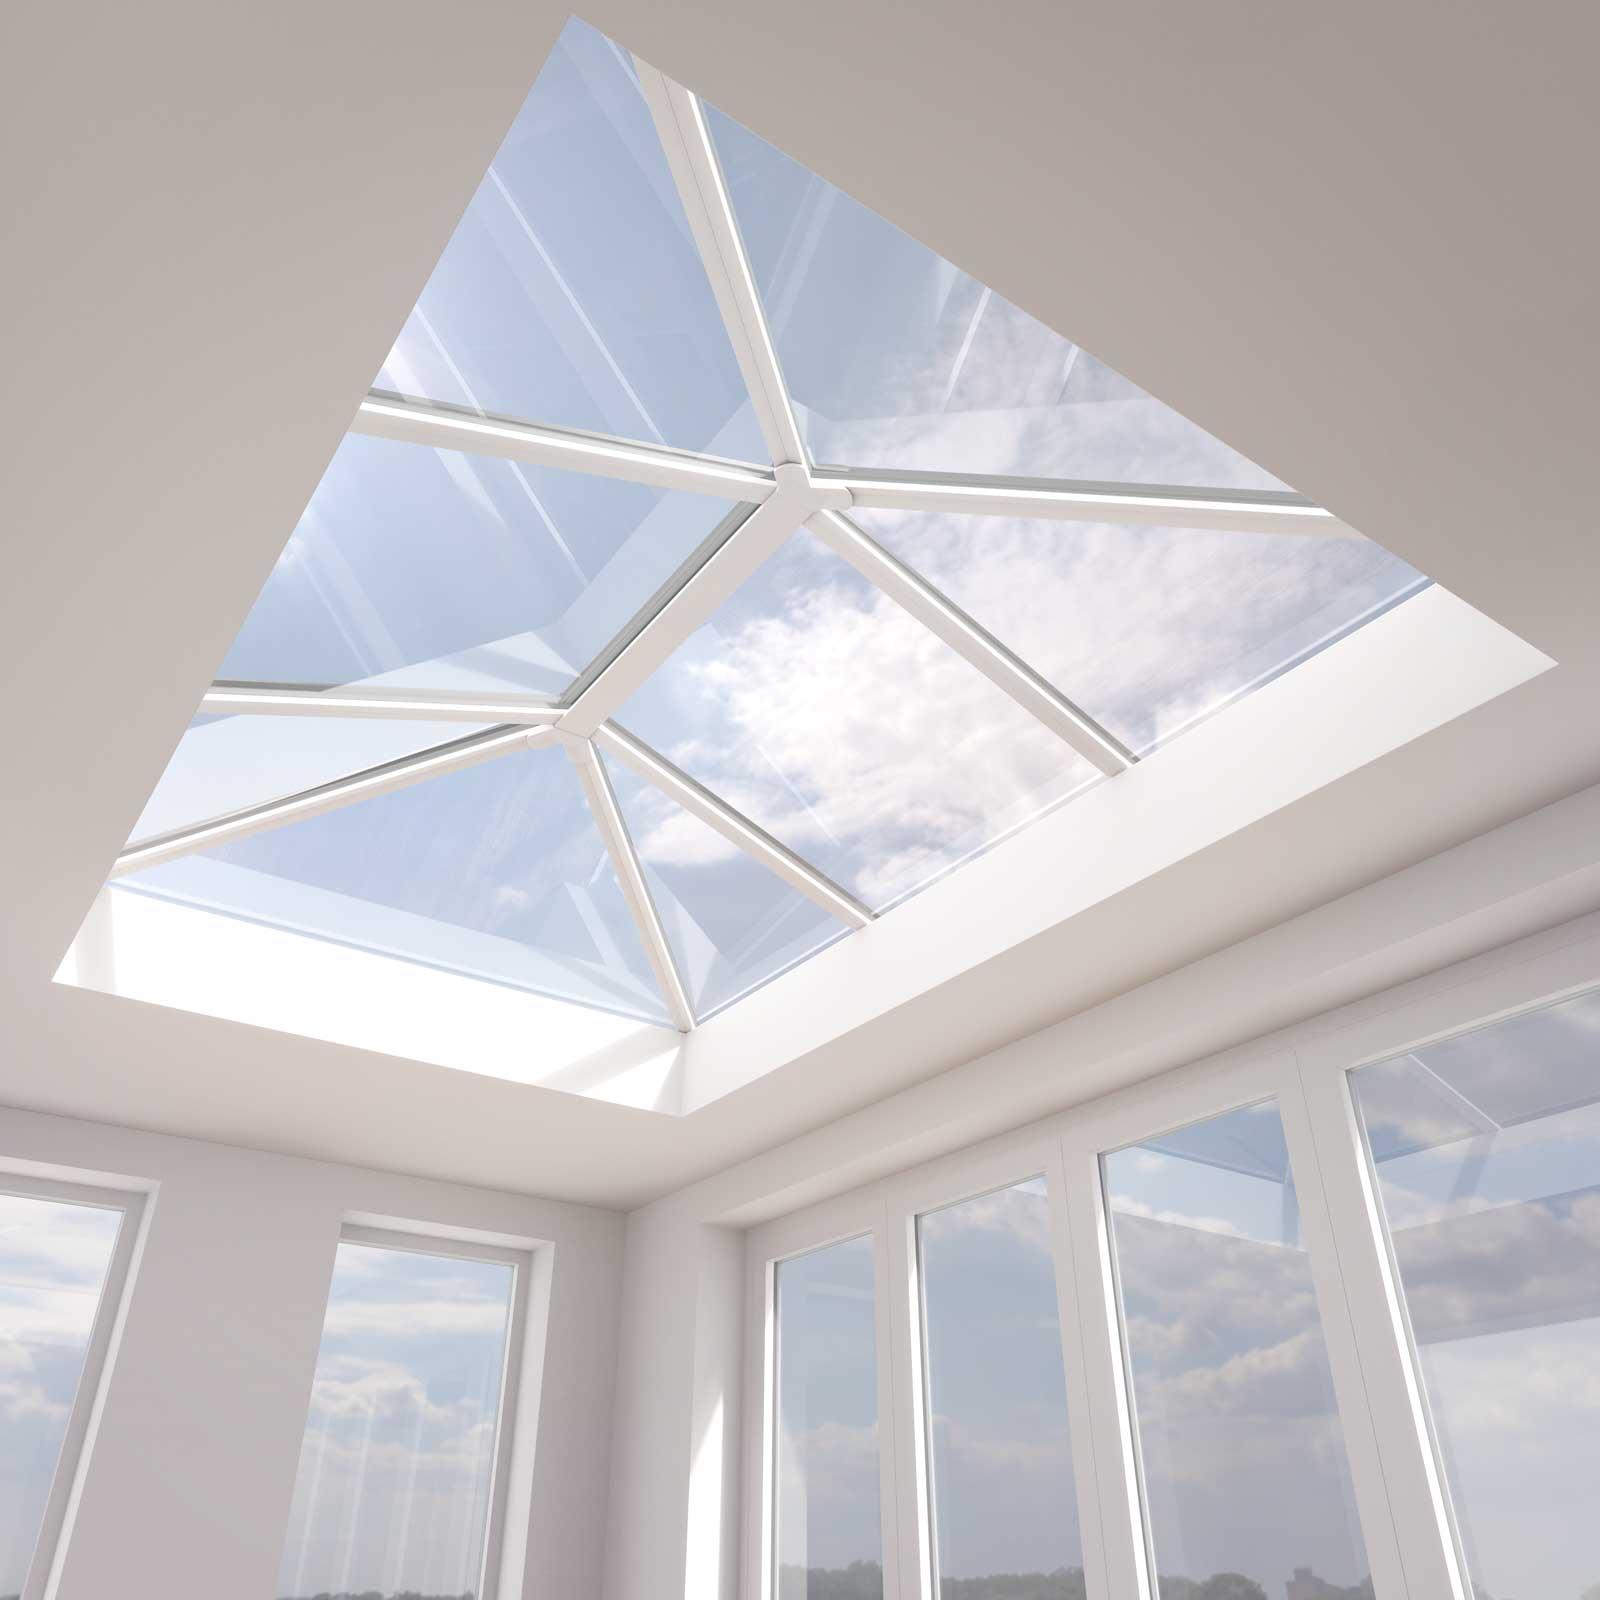 Aluminium Lantern Roofs Surrey & London